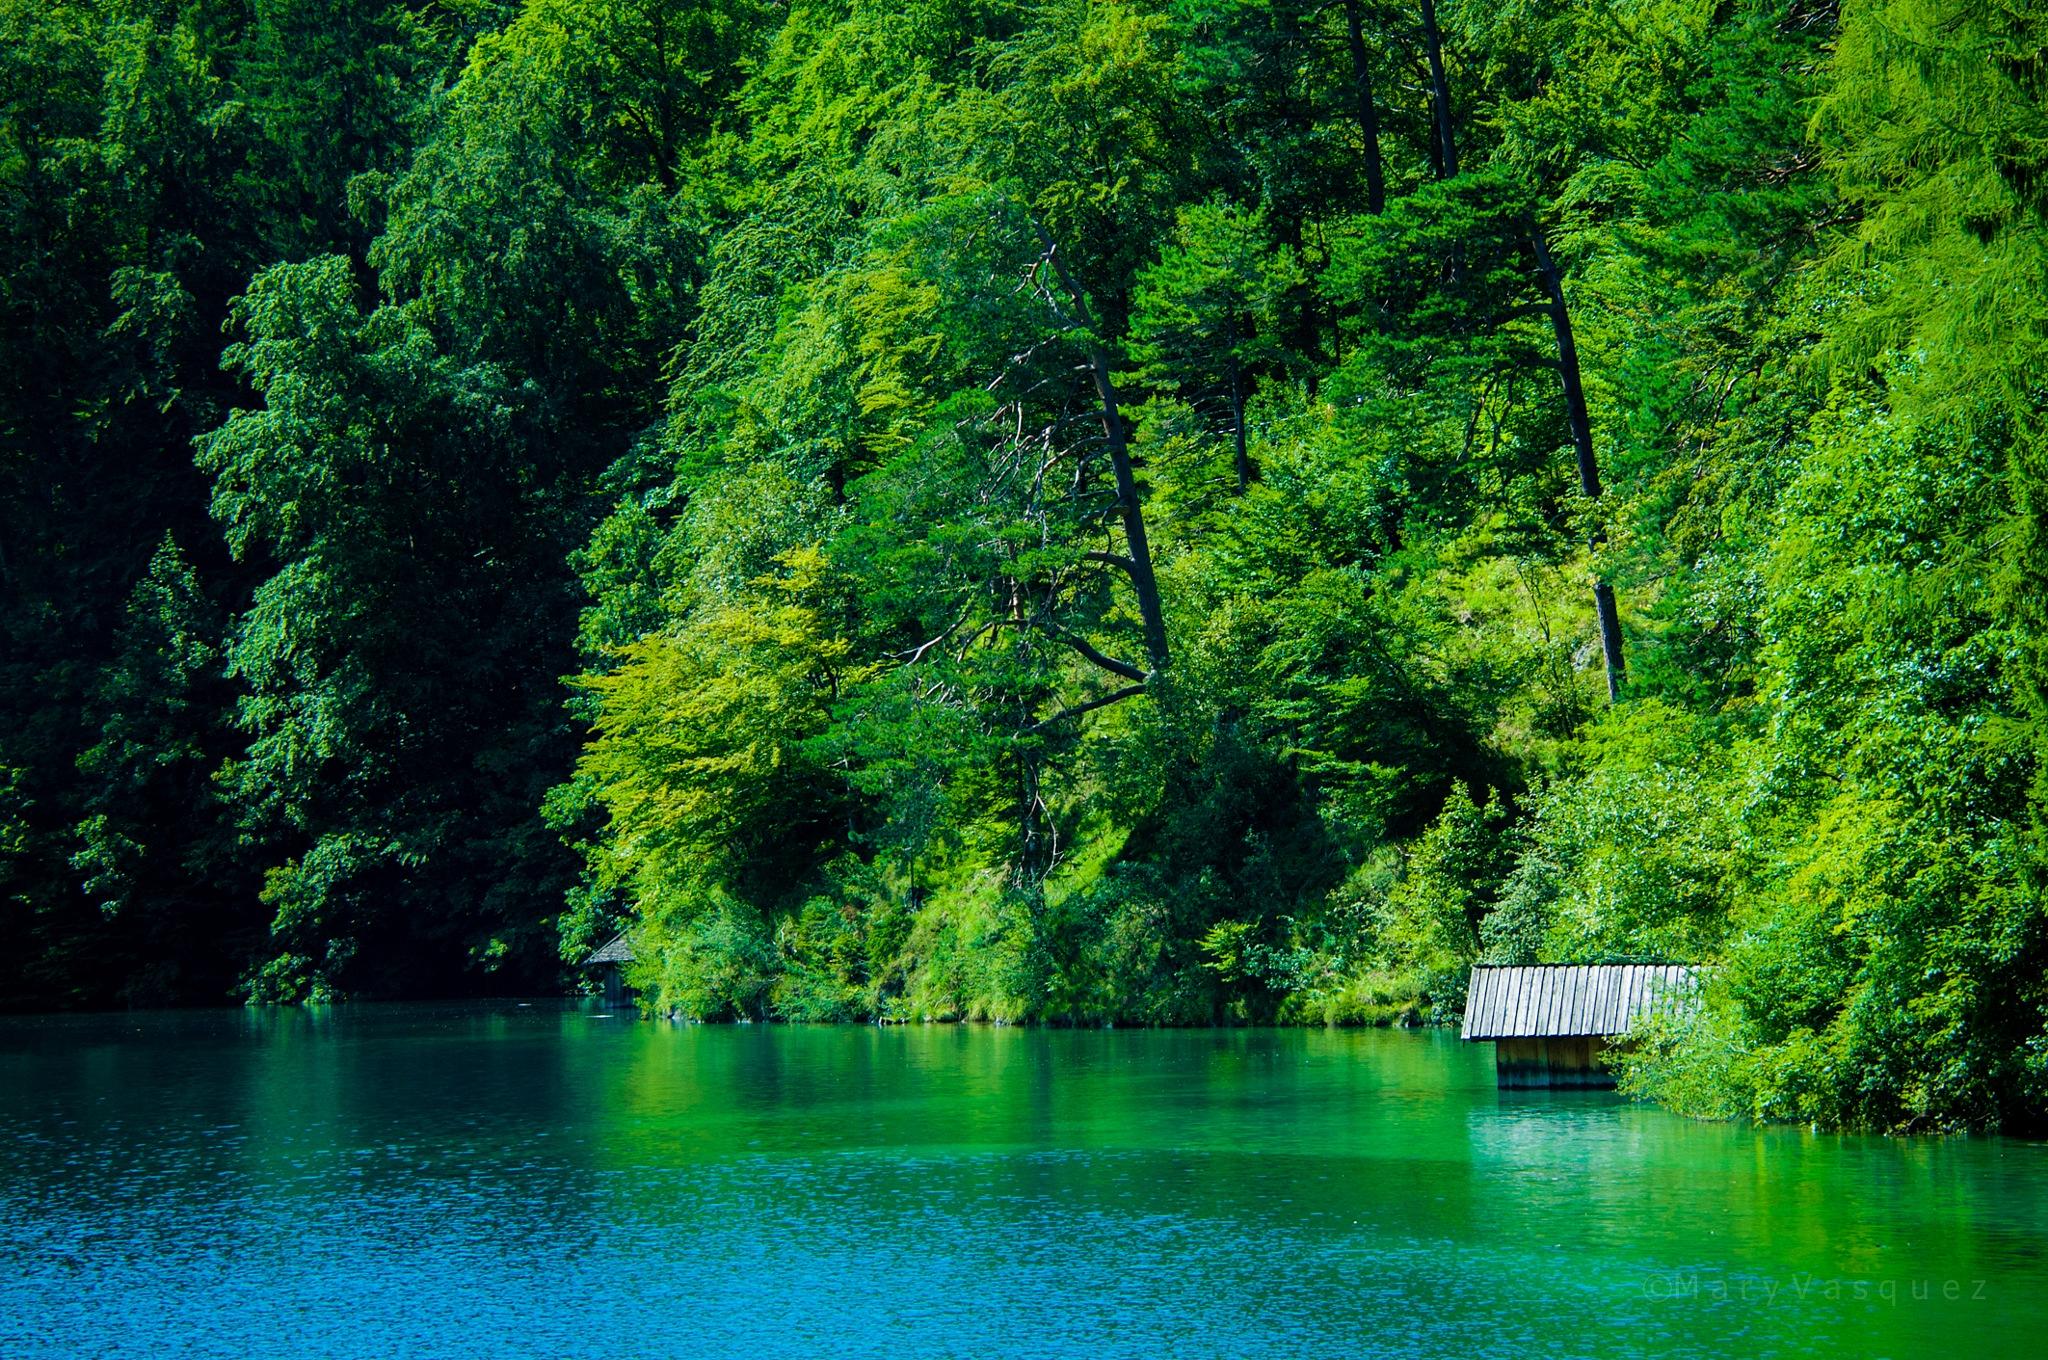 Alpsee Lake, Germany. by Mary Vasquez